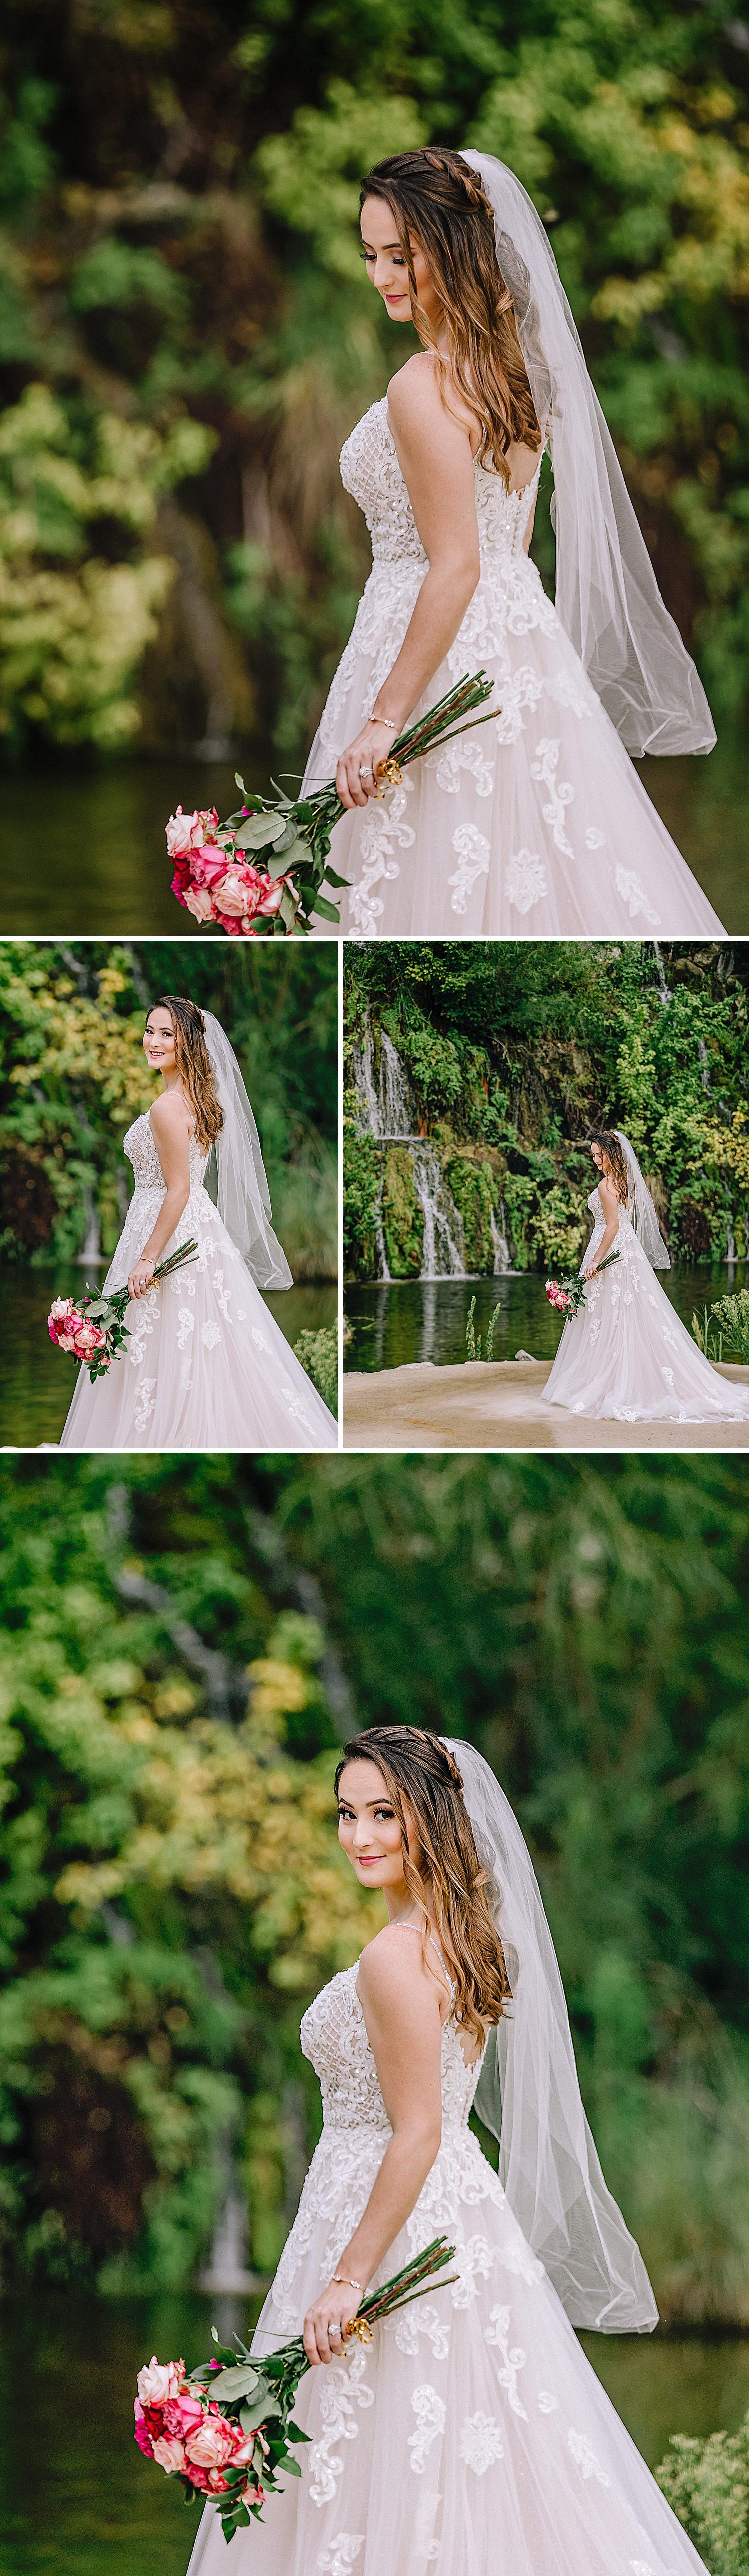 Carly-Barton-Photography-Bridal-Photos-Remis-Ridge-Hidden-Falls-New-Braunfels-Texas-Bride_0020.jpg